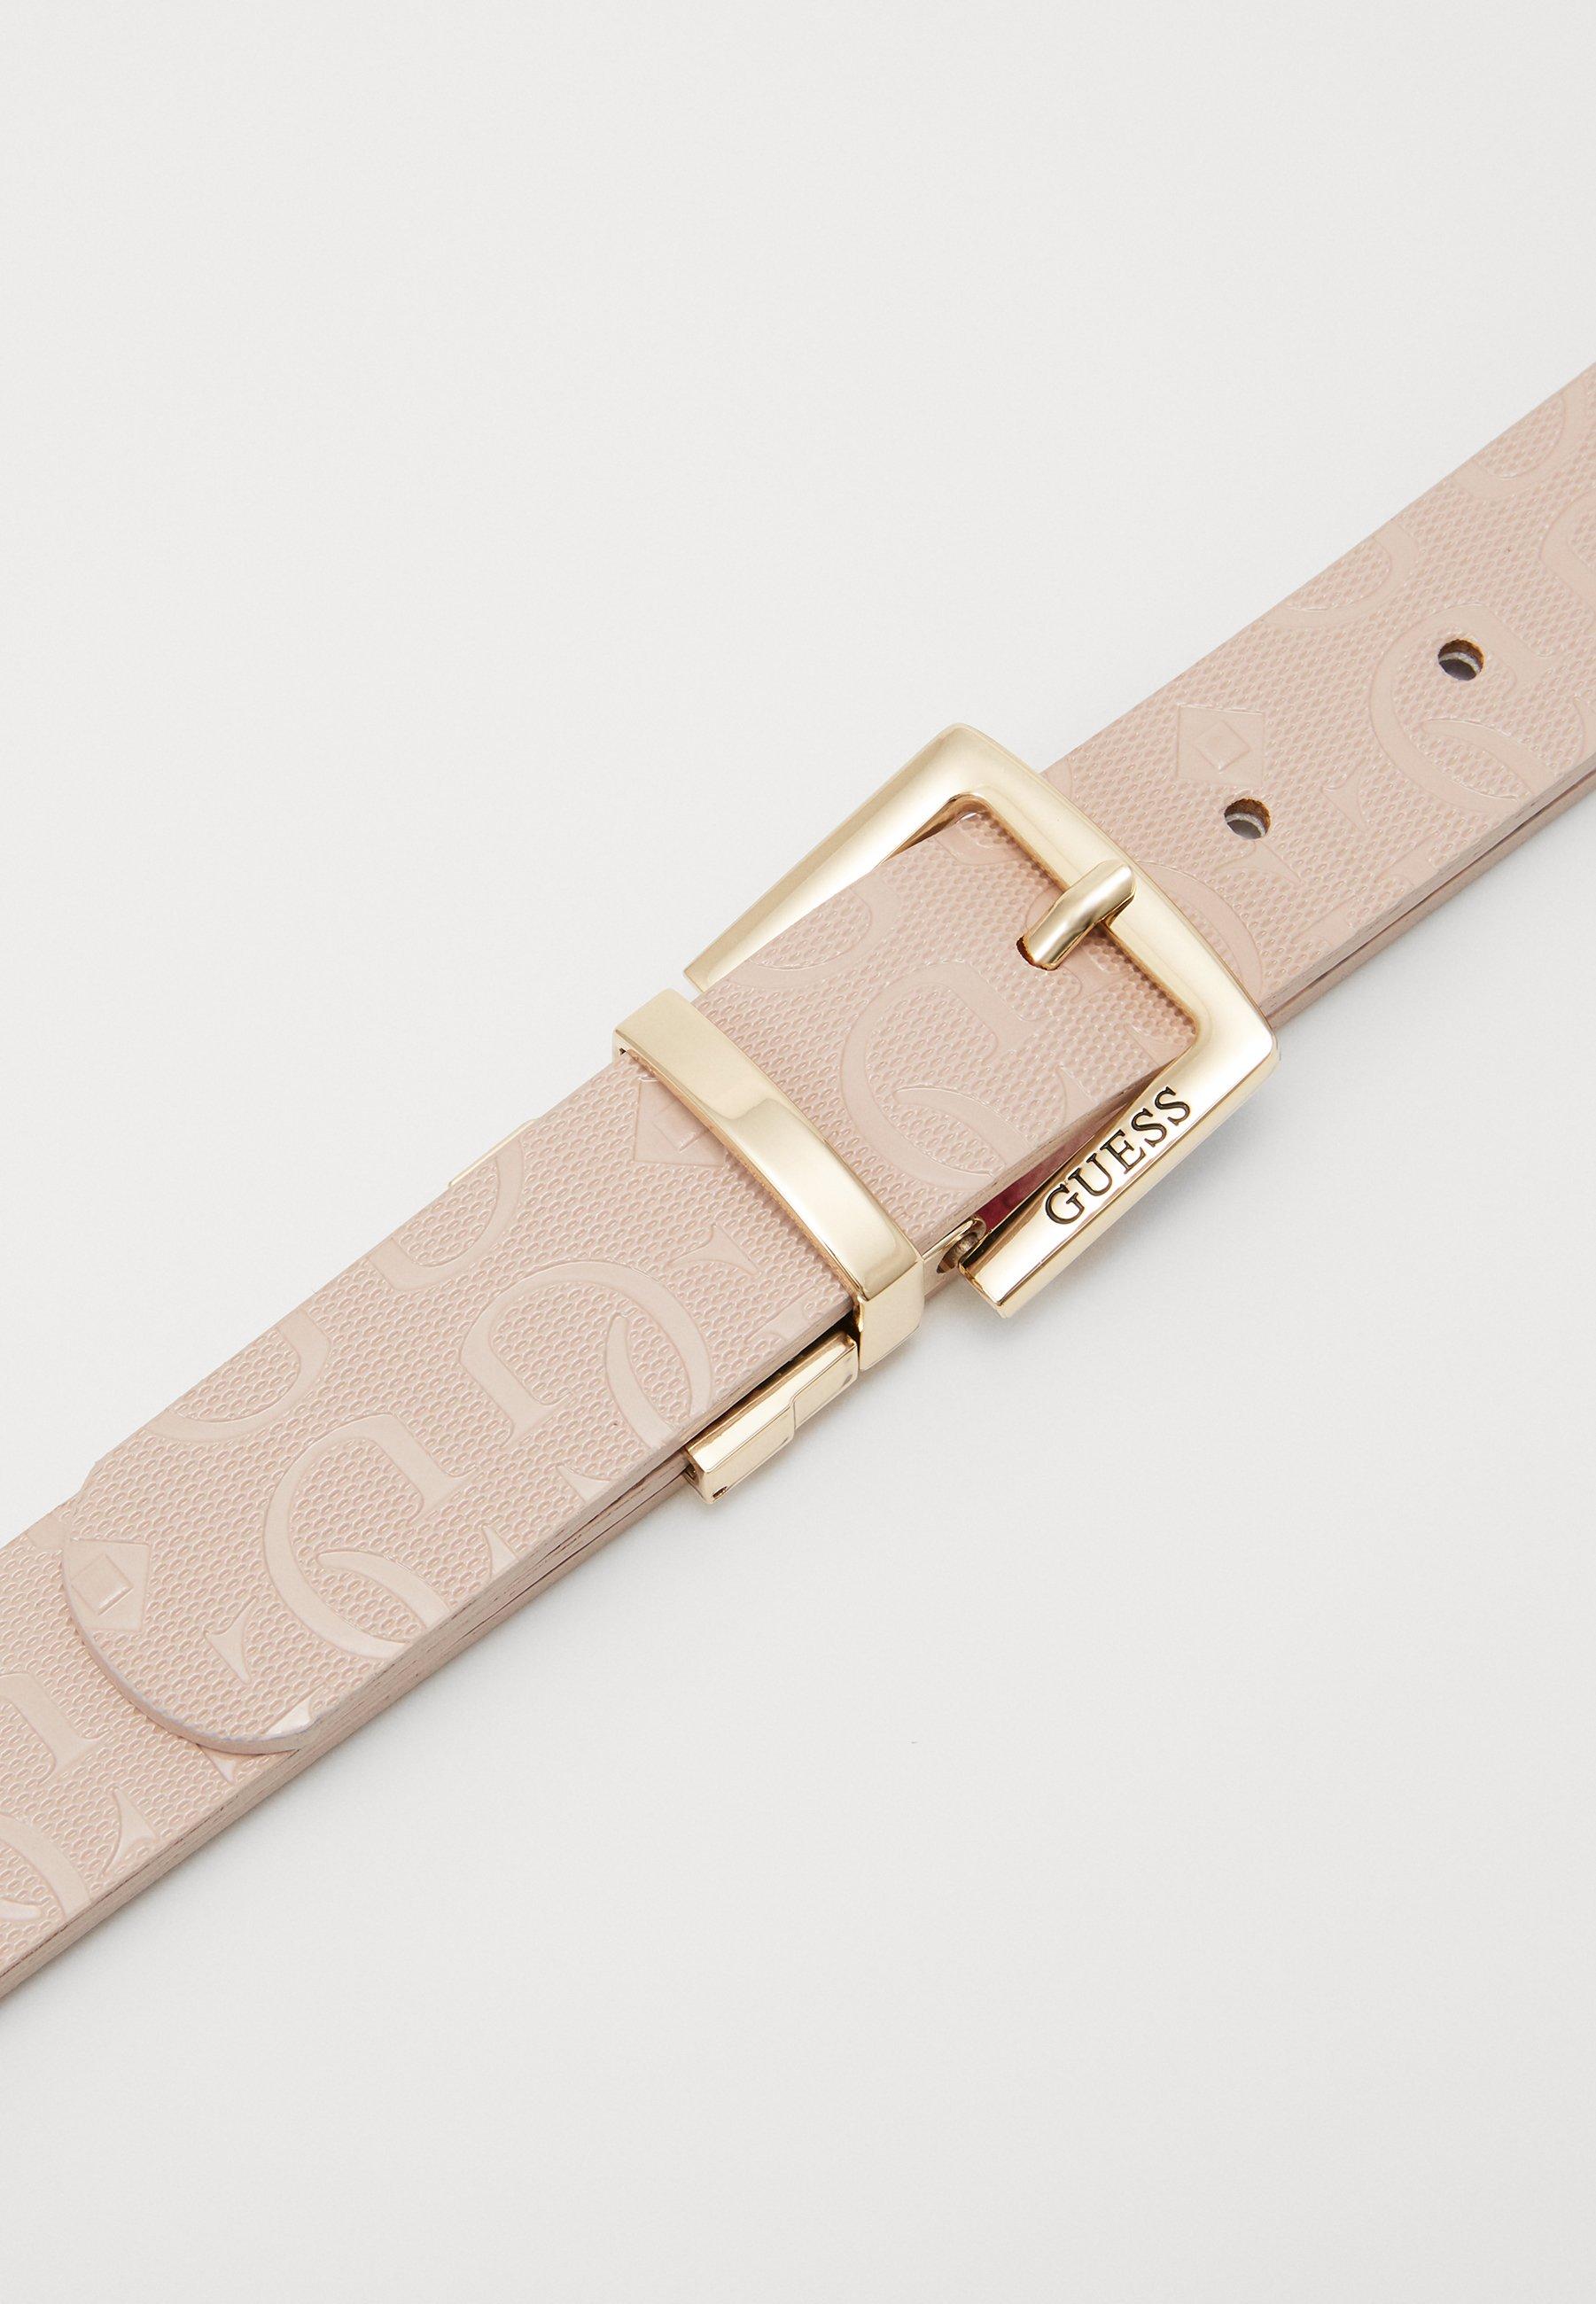 Guess CHIC SHINE PANT BELT - Belte - blush/rosa yS2mxndOeTtwktR